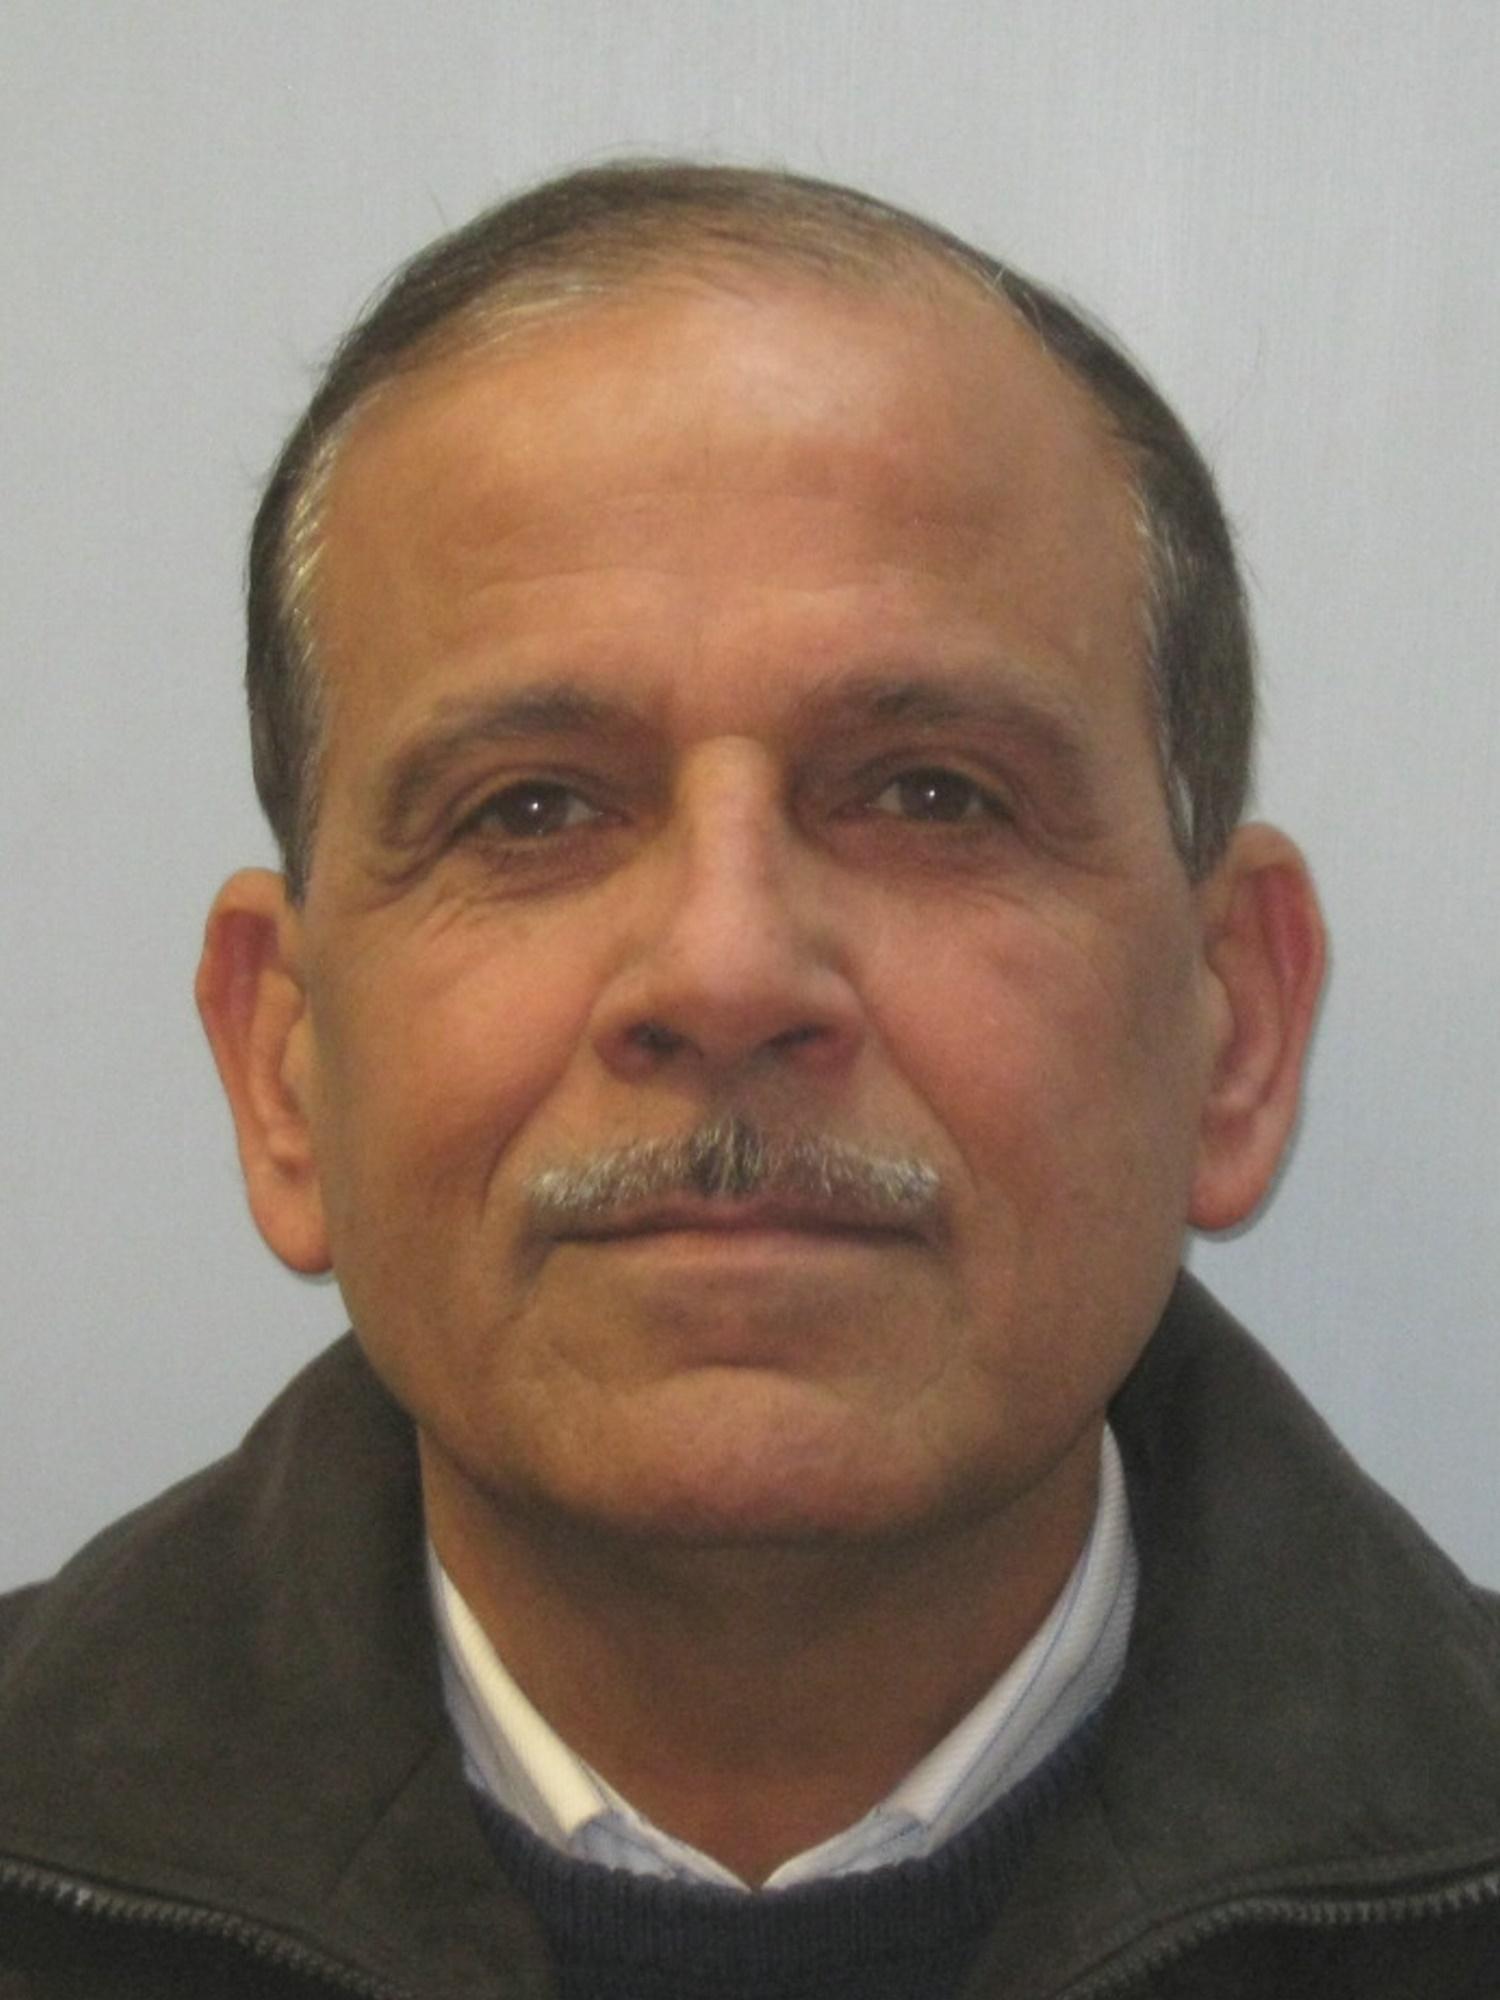 Mohammed Mehdi Farid